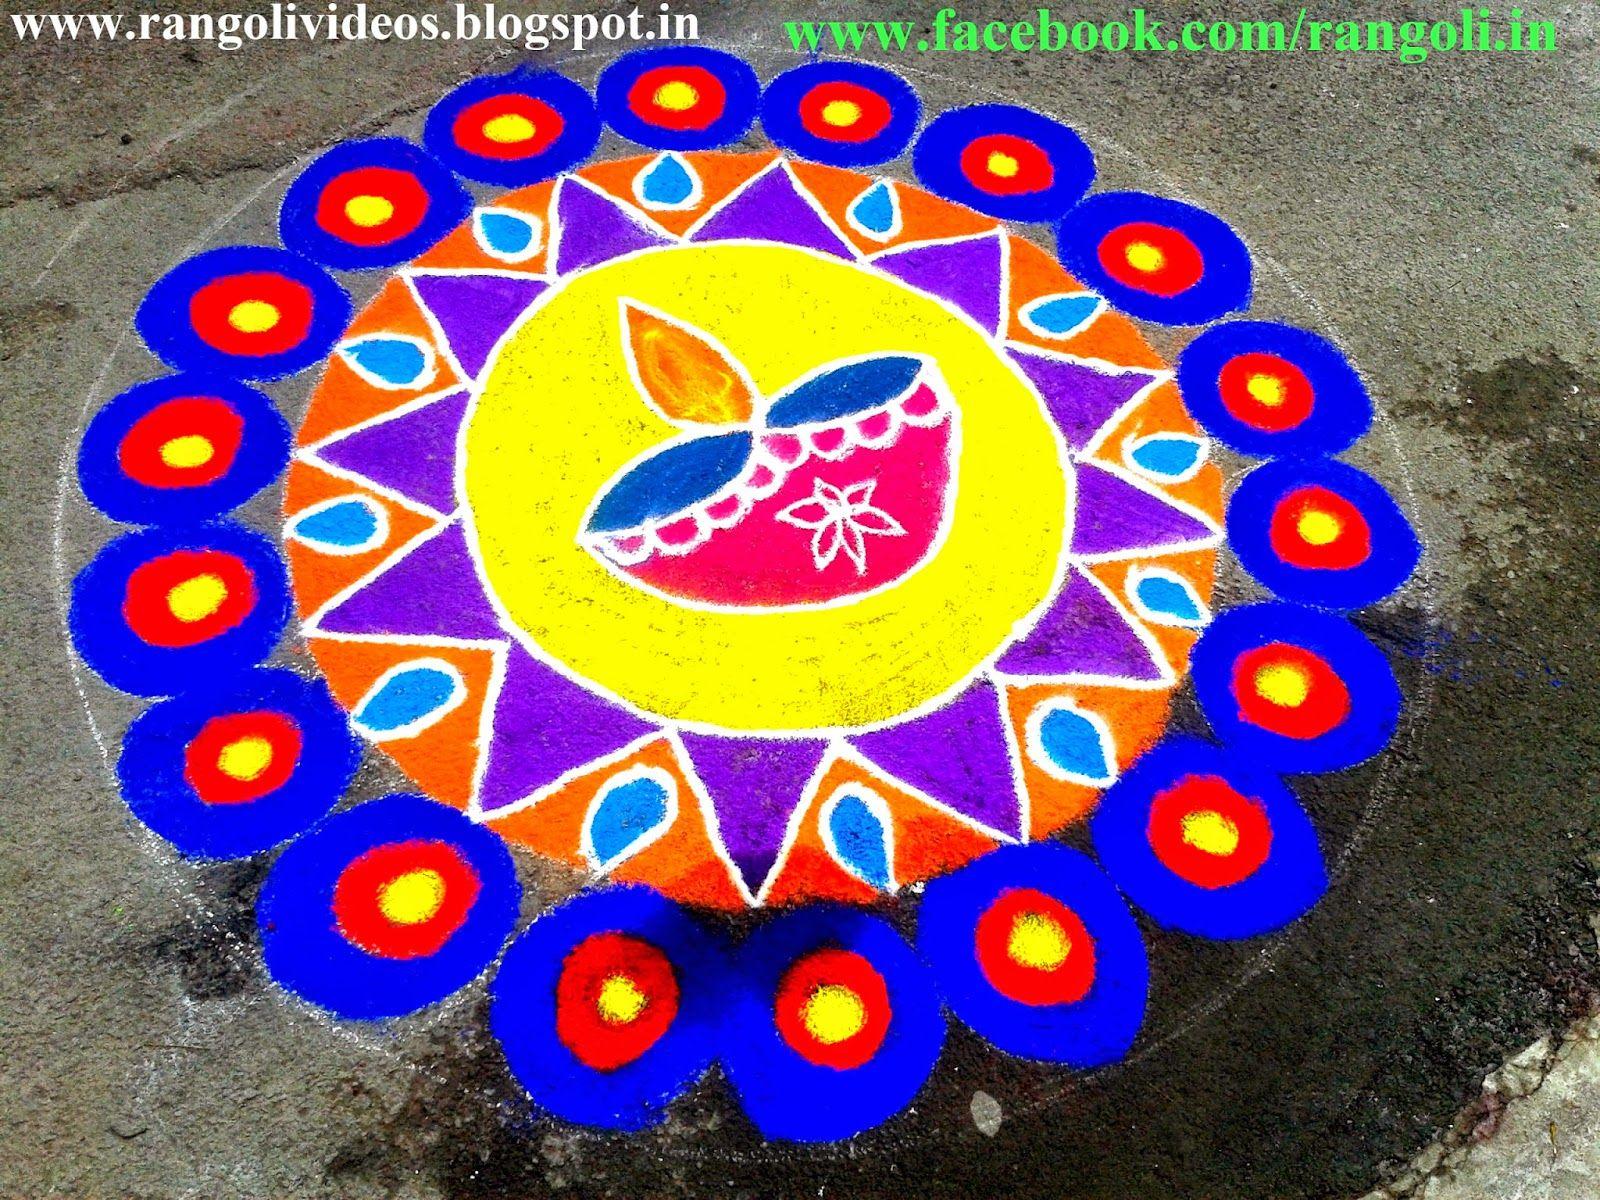 Diwali Rangoli 2013 Rangoli designs diwali, Easy rangoli